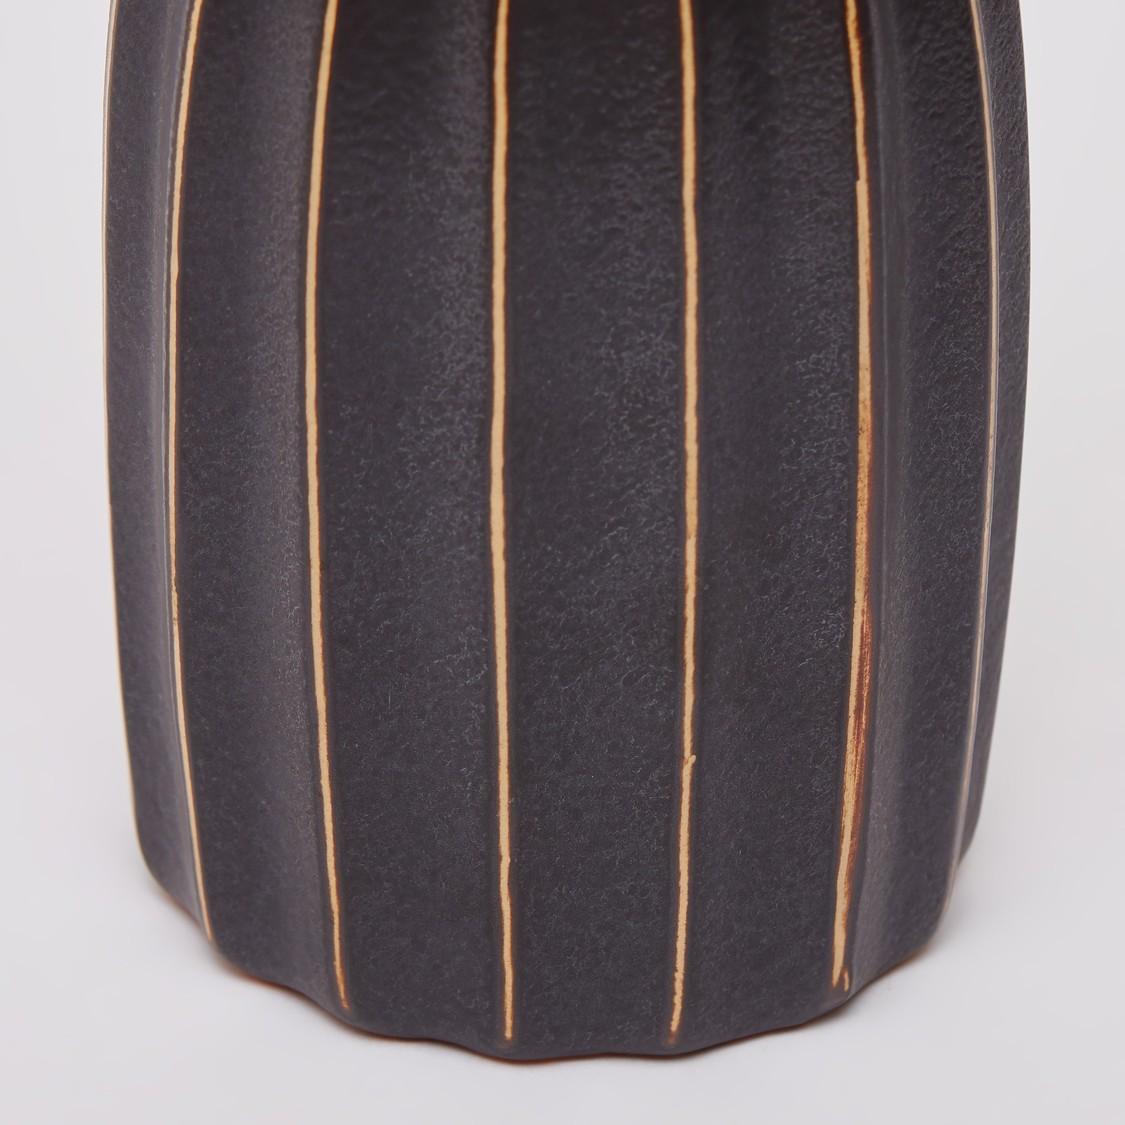 Stripe Detail Decorative Vase - 30x12 cms